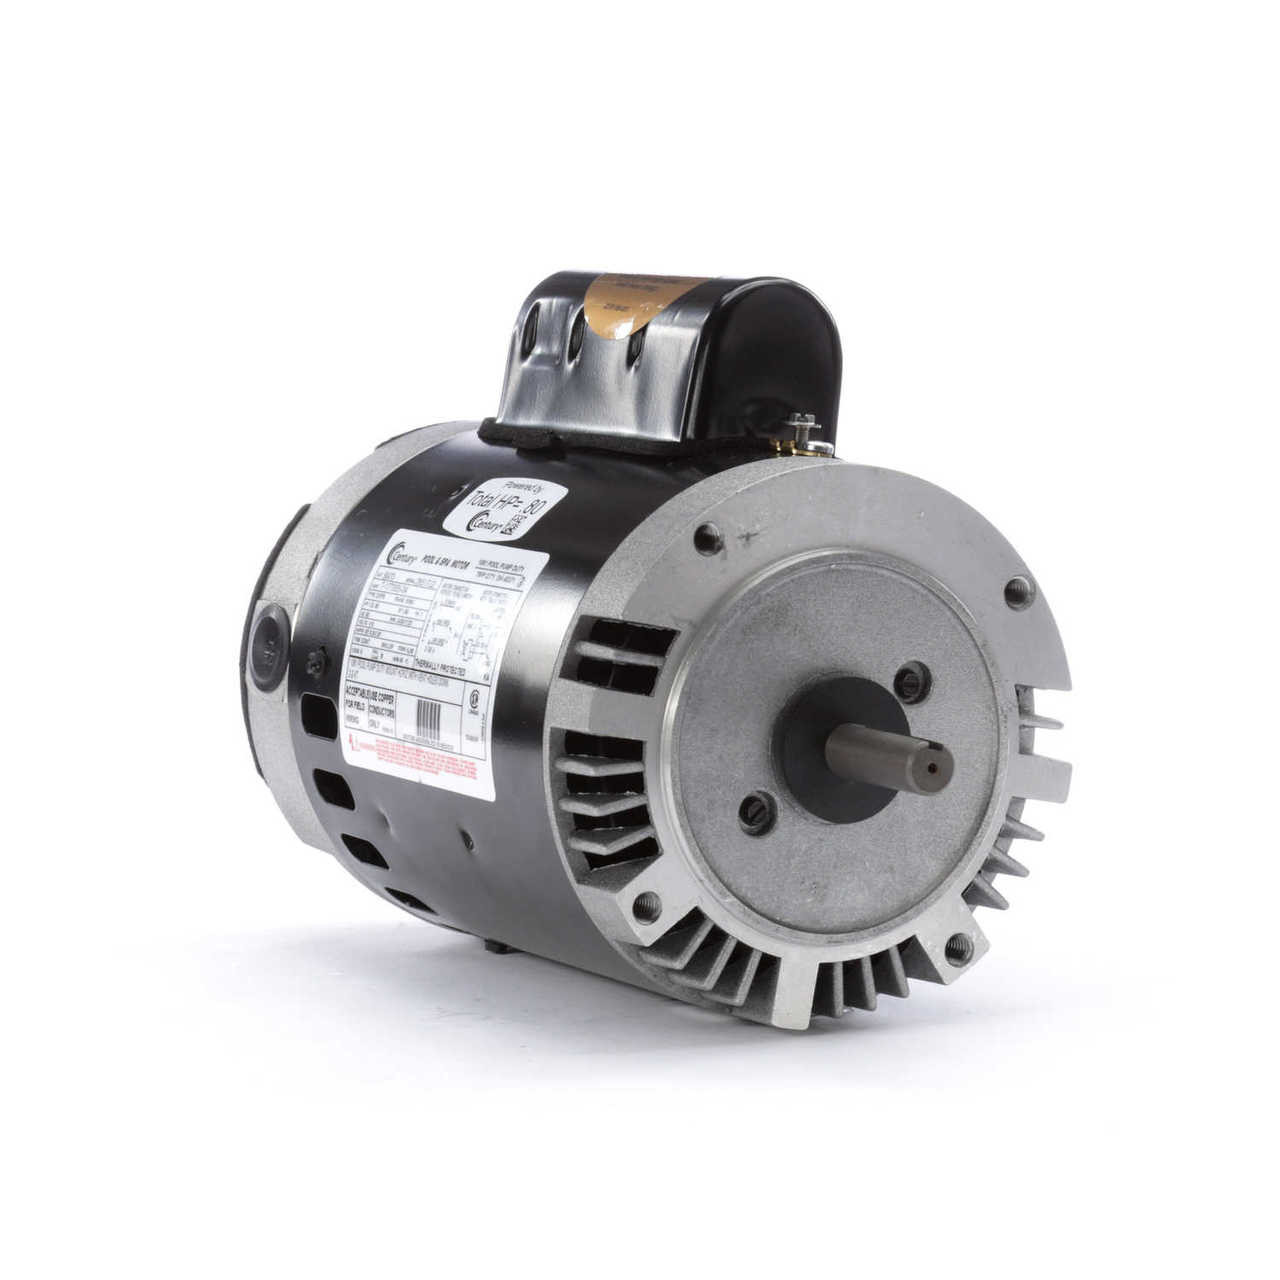 1 HP 2-Speed 56J Frame 230V; 2 Speed Swimming Pool Motor Century # B2975